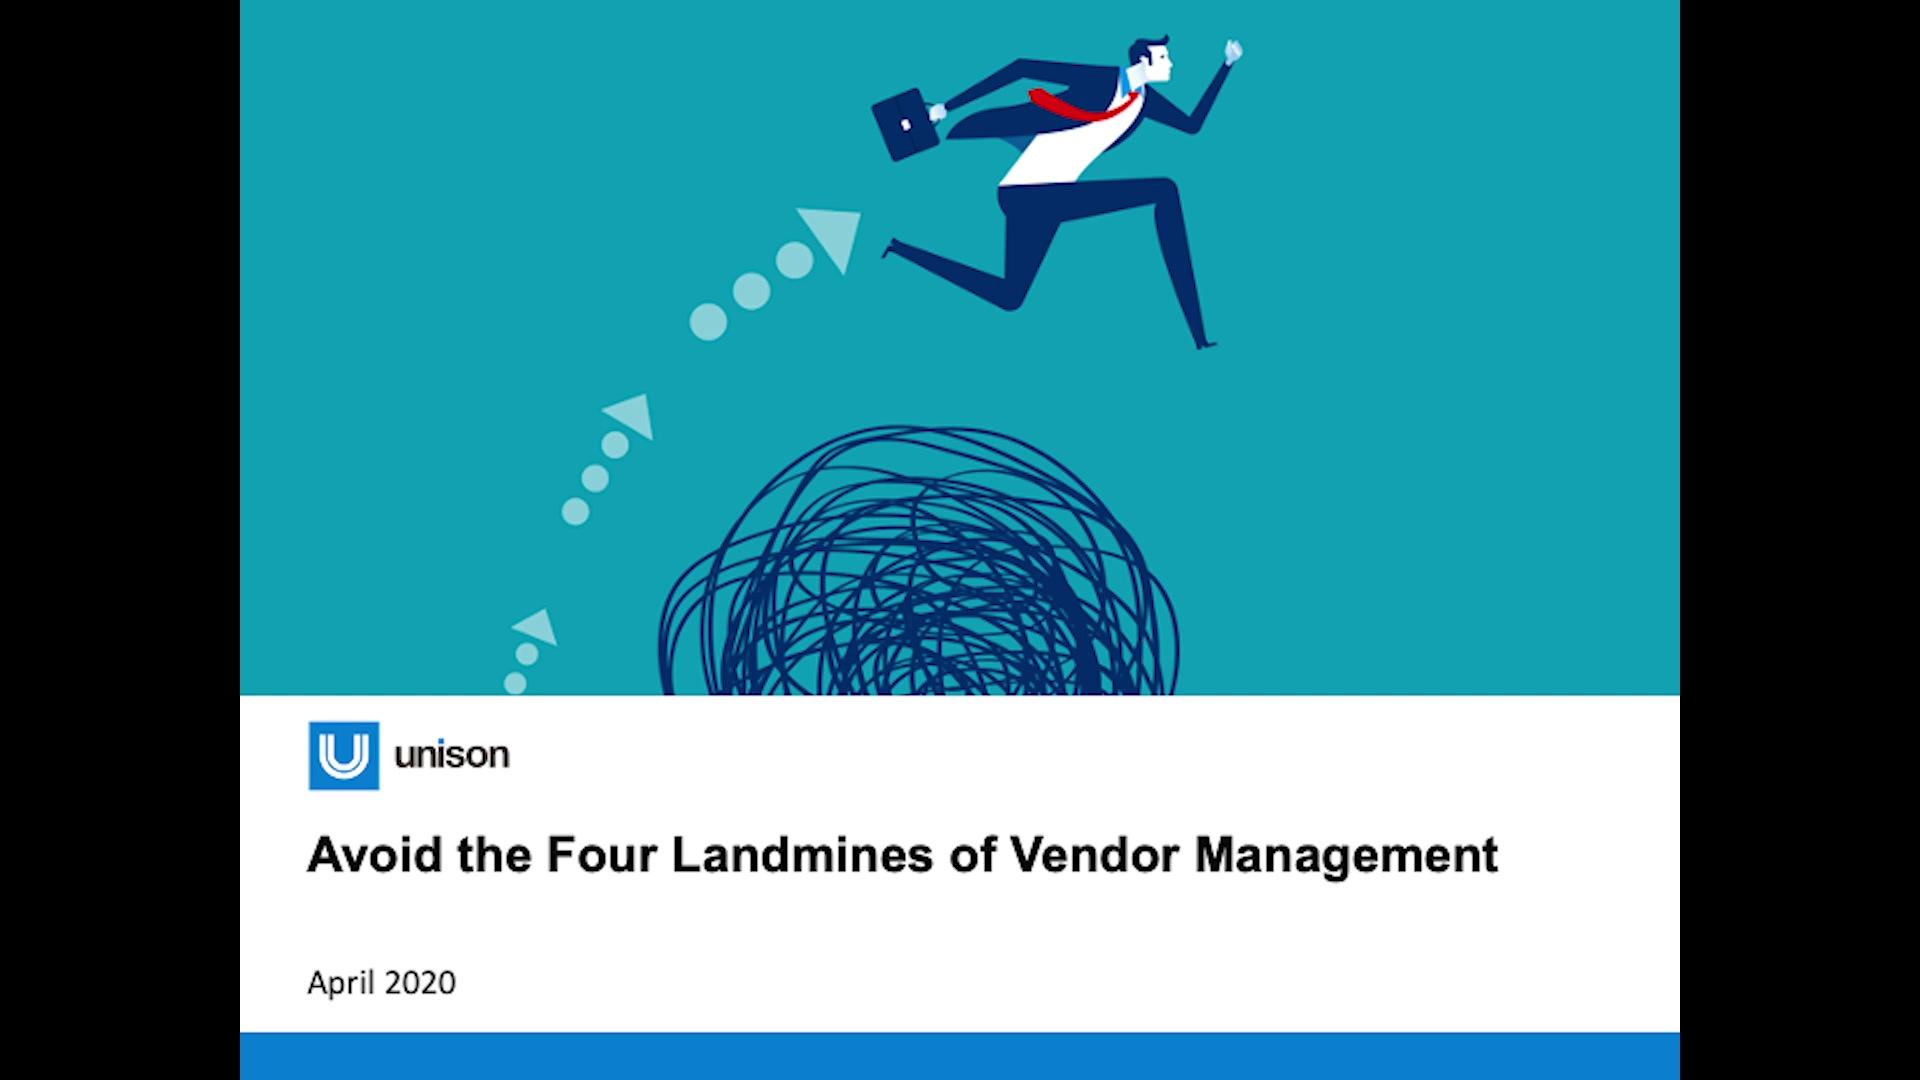 The Four Landmines of Vendor Management